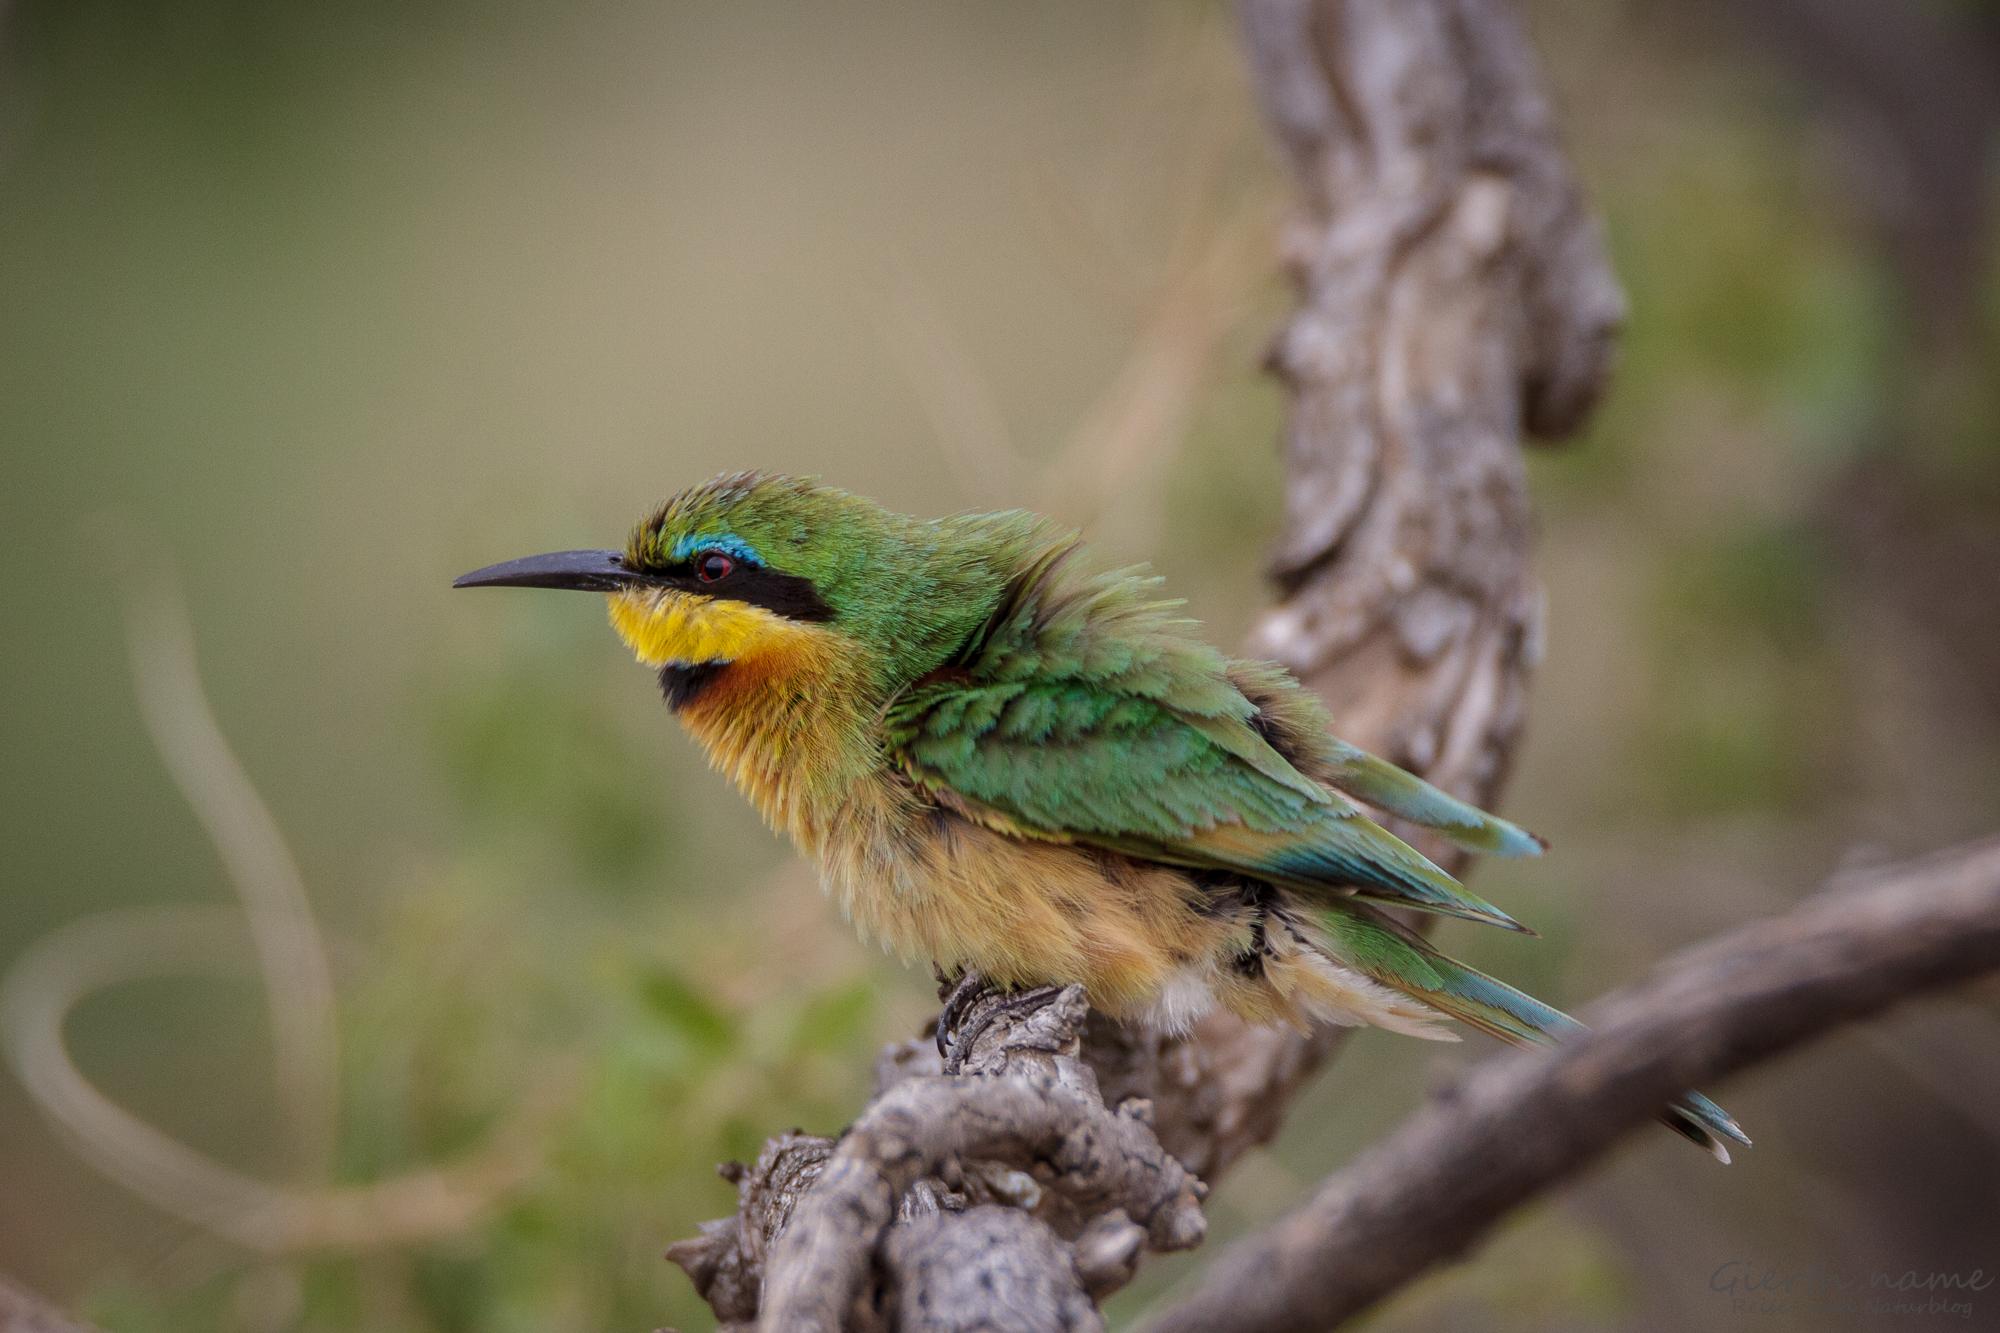 Zwergspint - Little bee-eater - Merops pusillus